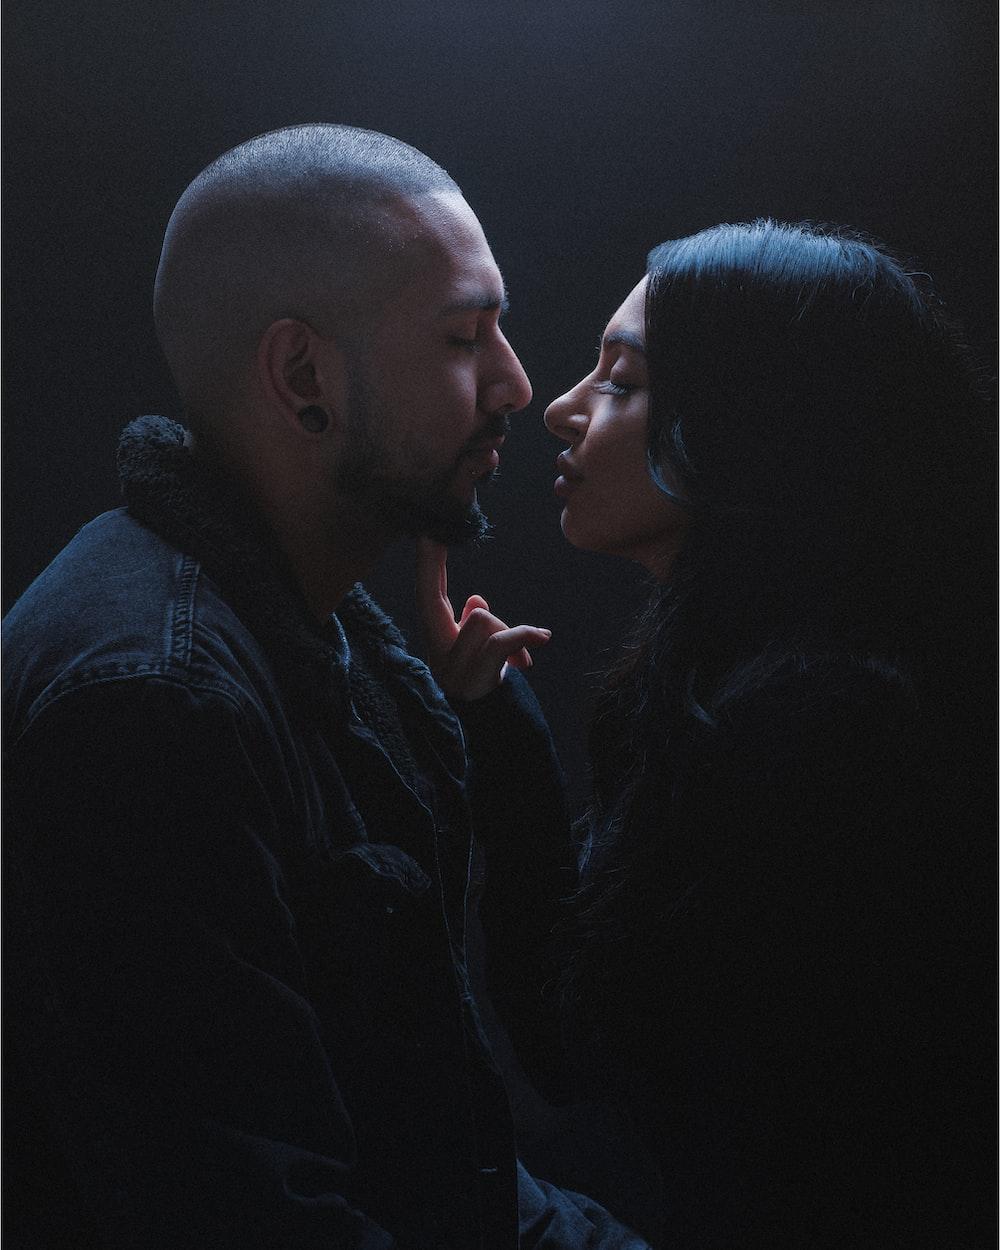 man in black dress shirt kissing woman in black dress